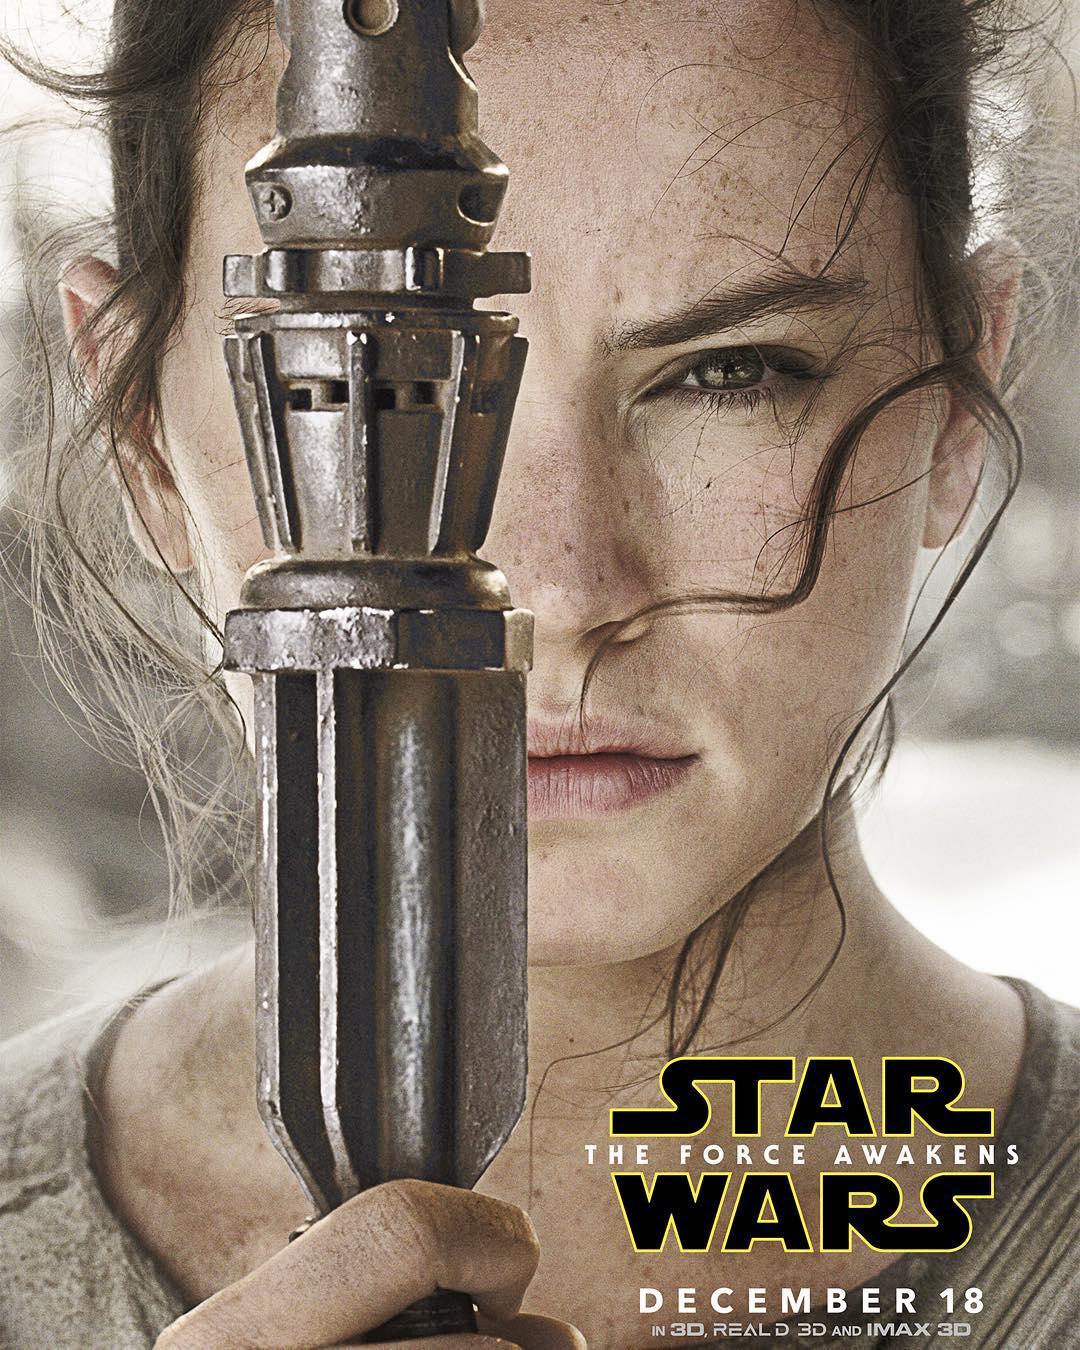 Download Wallpaper Movie Rey - Rey-SW-The-Force-Awakens-star-wars-the-force-awakens-movie-39101638-1080-1350  Trends_2735100.jpg